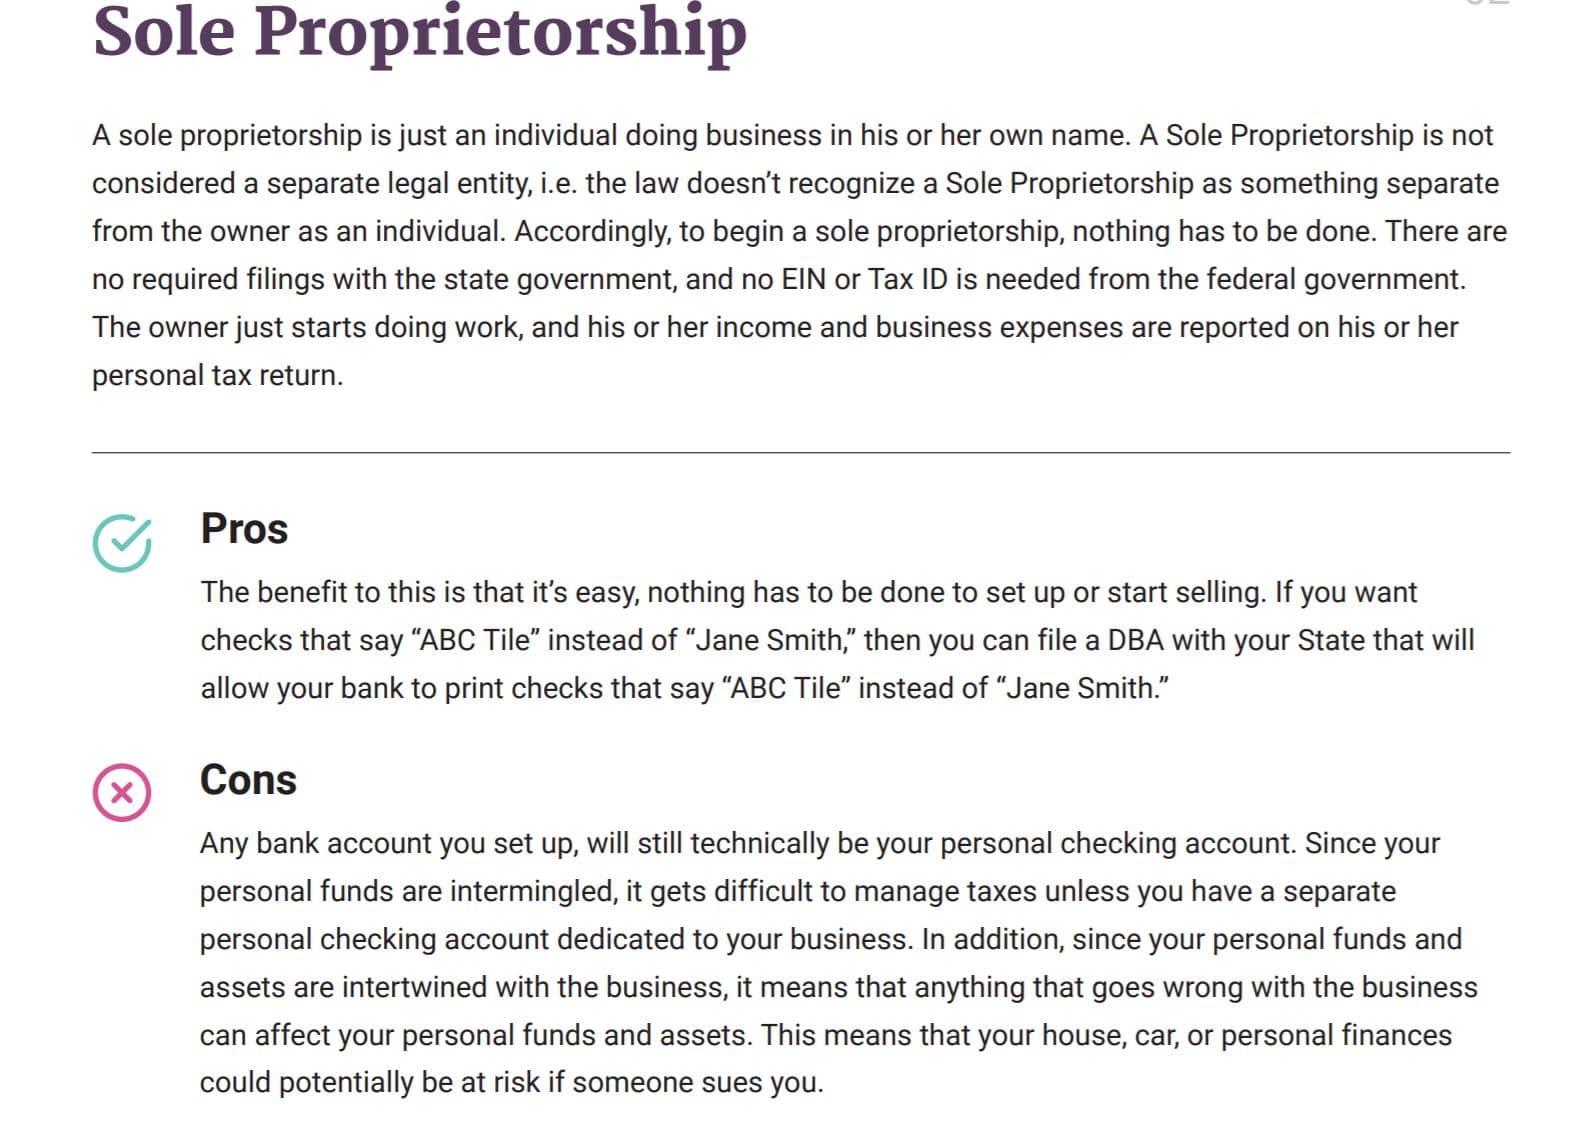 BetterLegal Sole Proprietorships